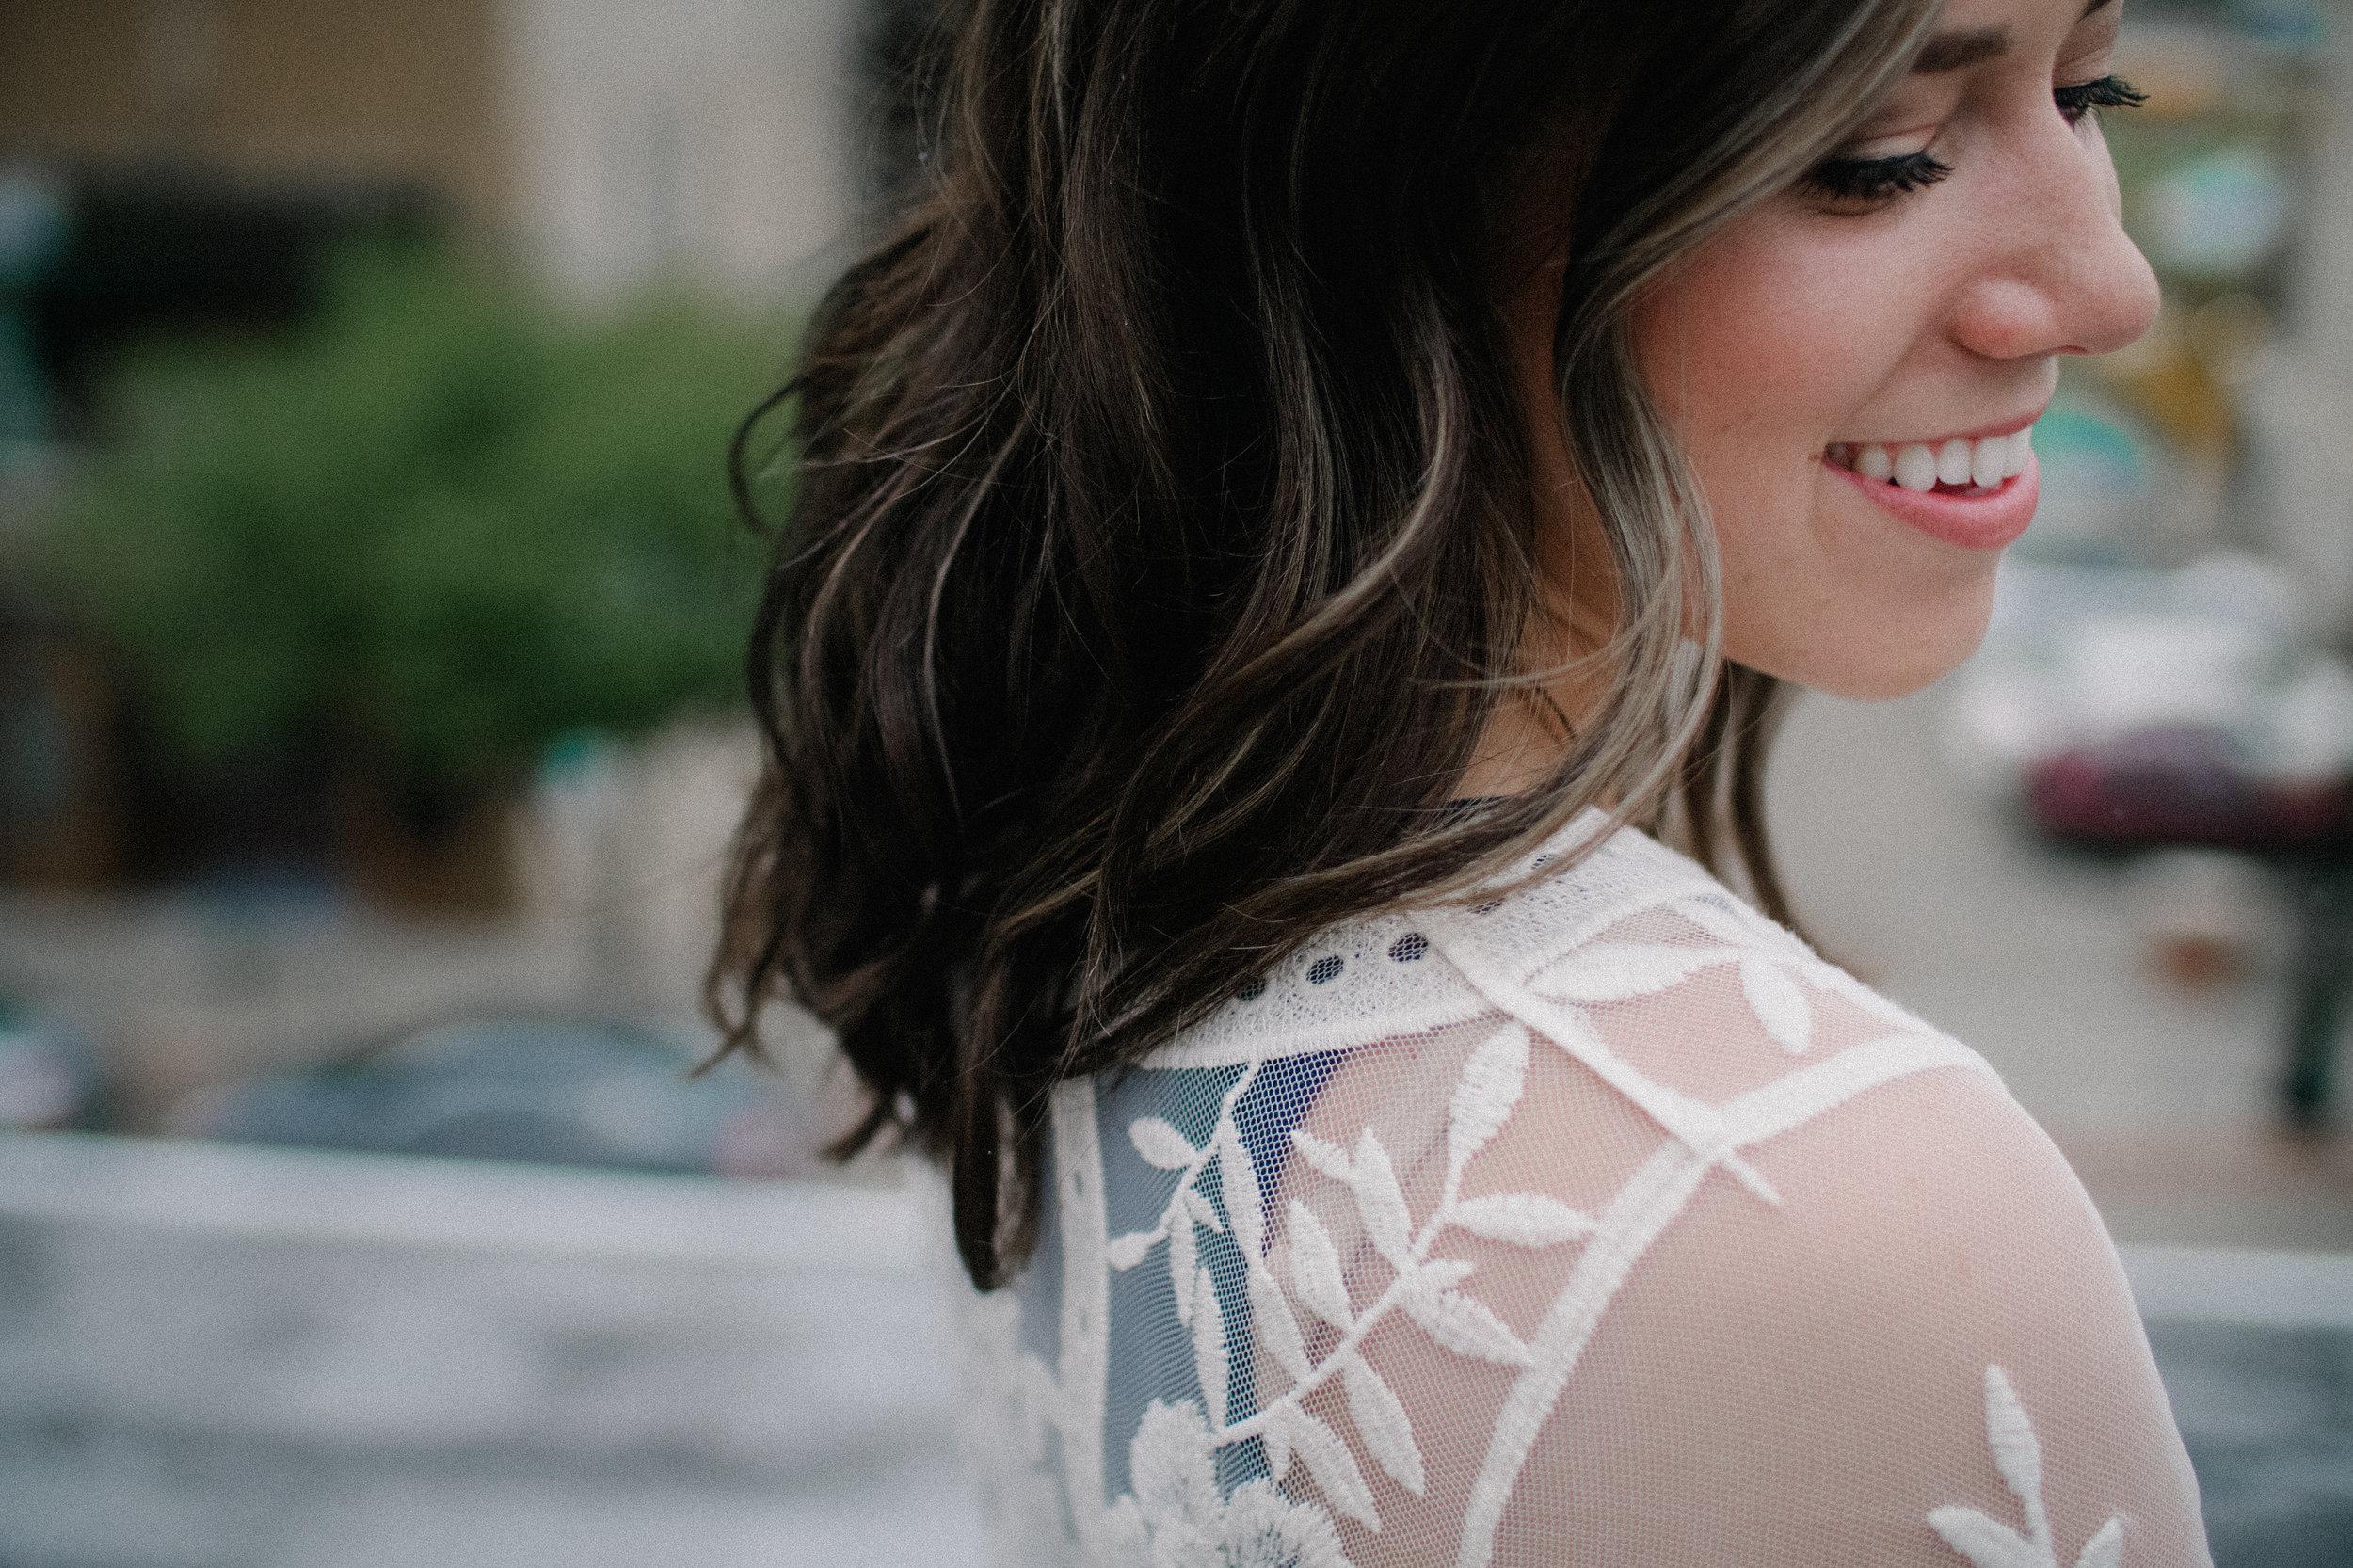 Lauren_Nick_Manzer_Bailey_Engagement_Photos_0106.jpg